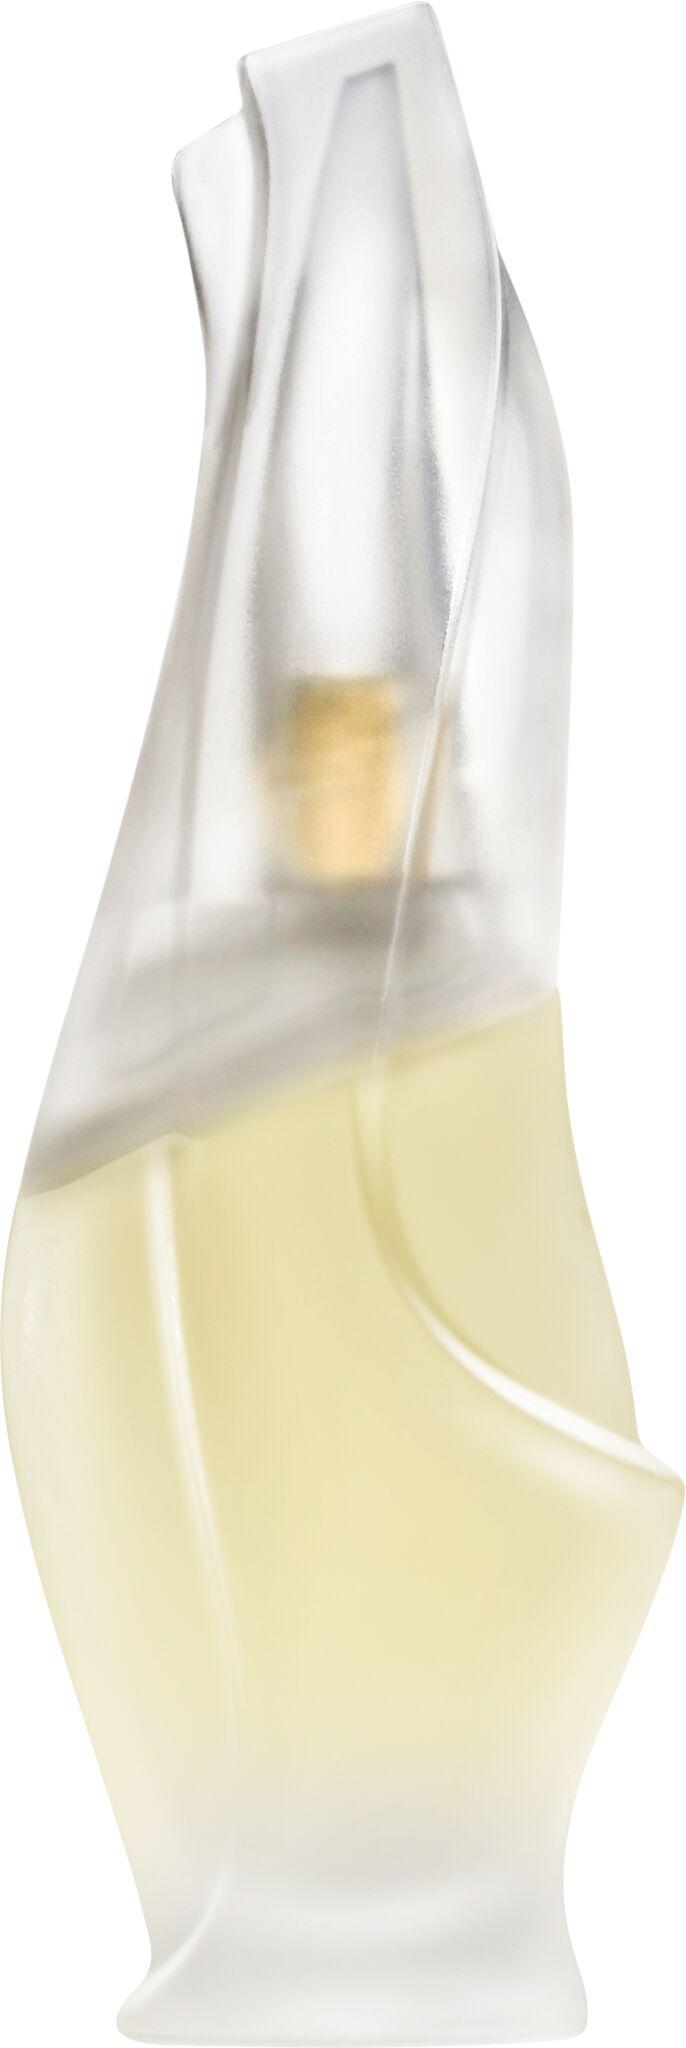 DKNY Cashmere Mist EDT, 30 ml